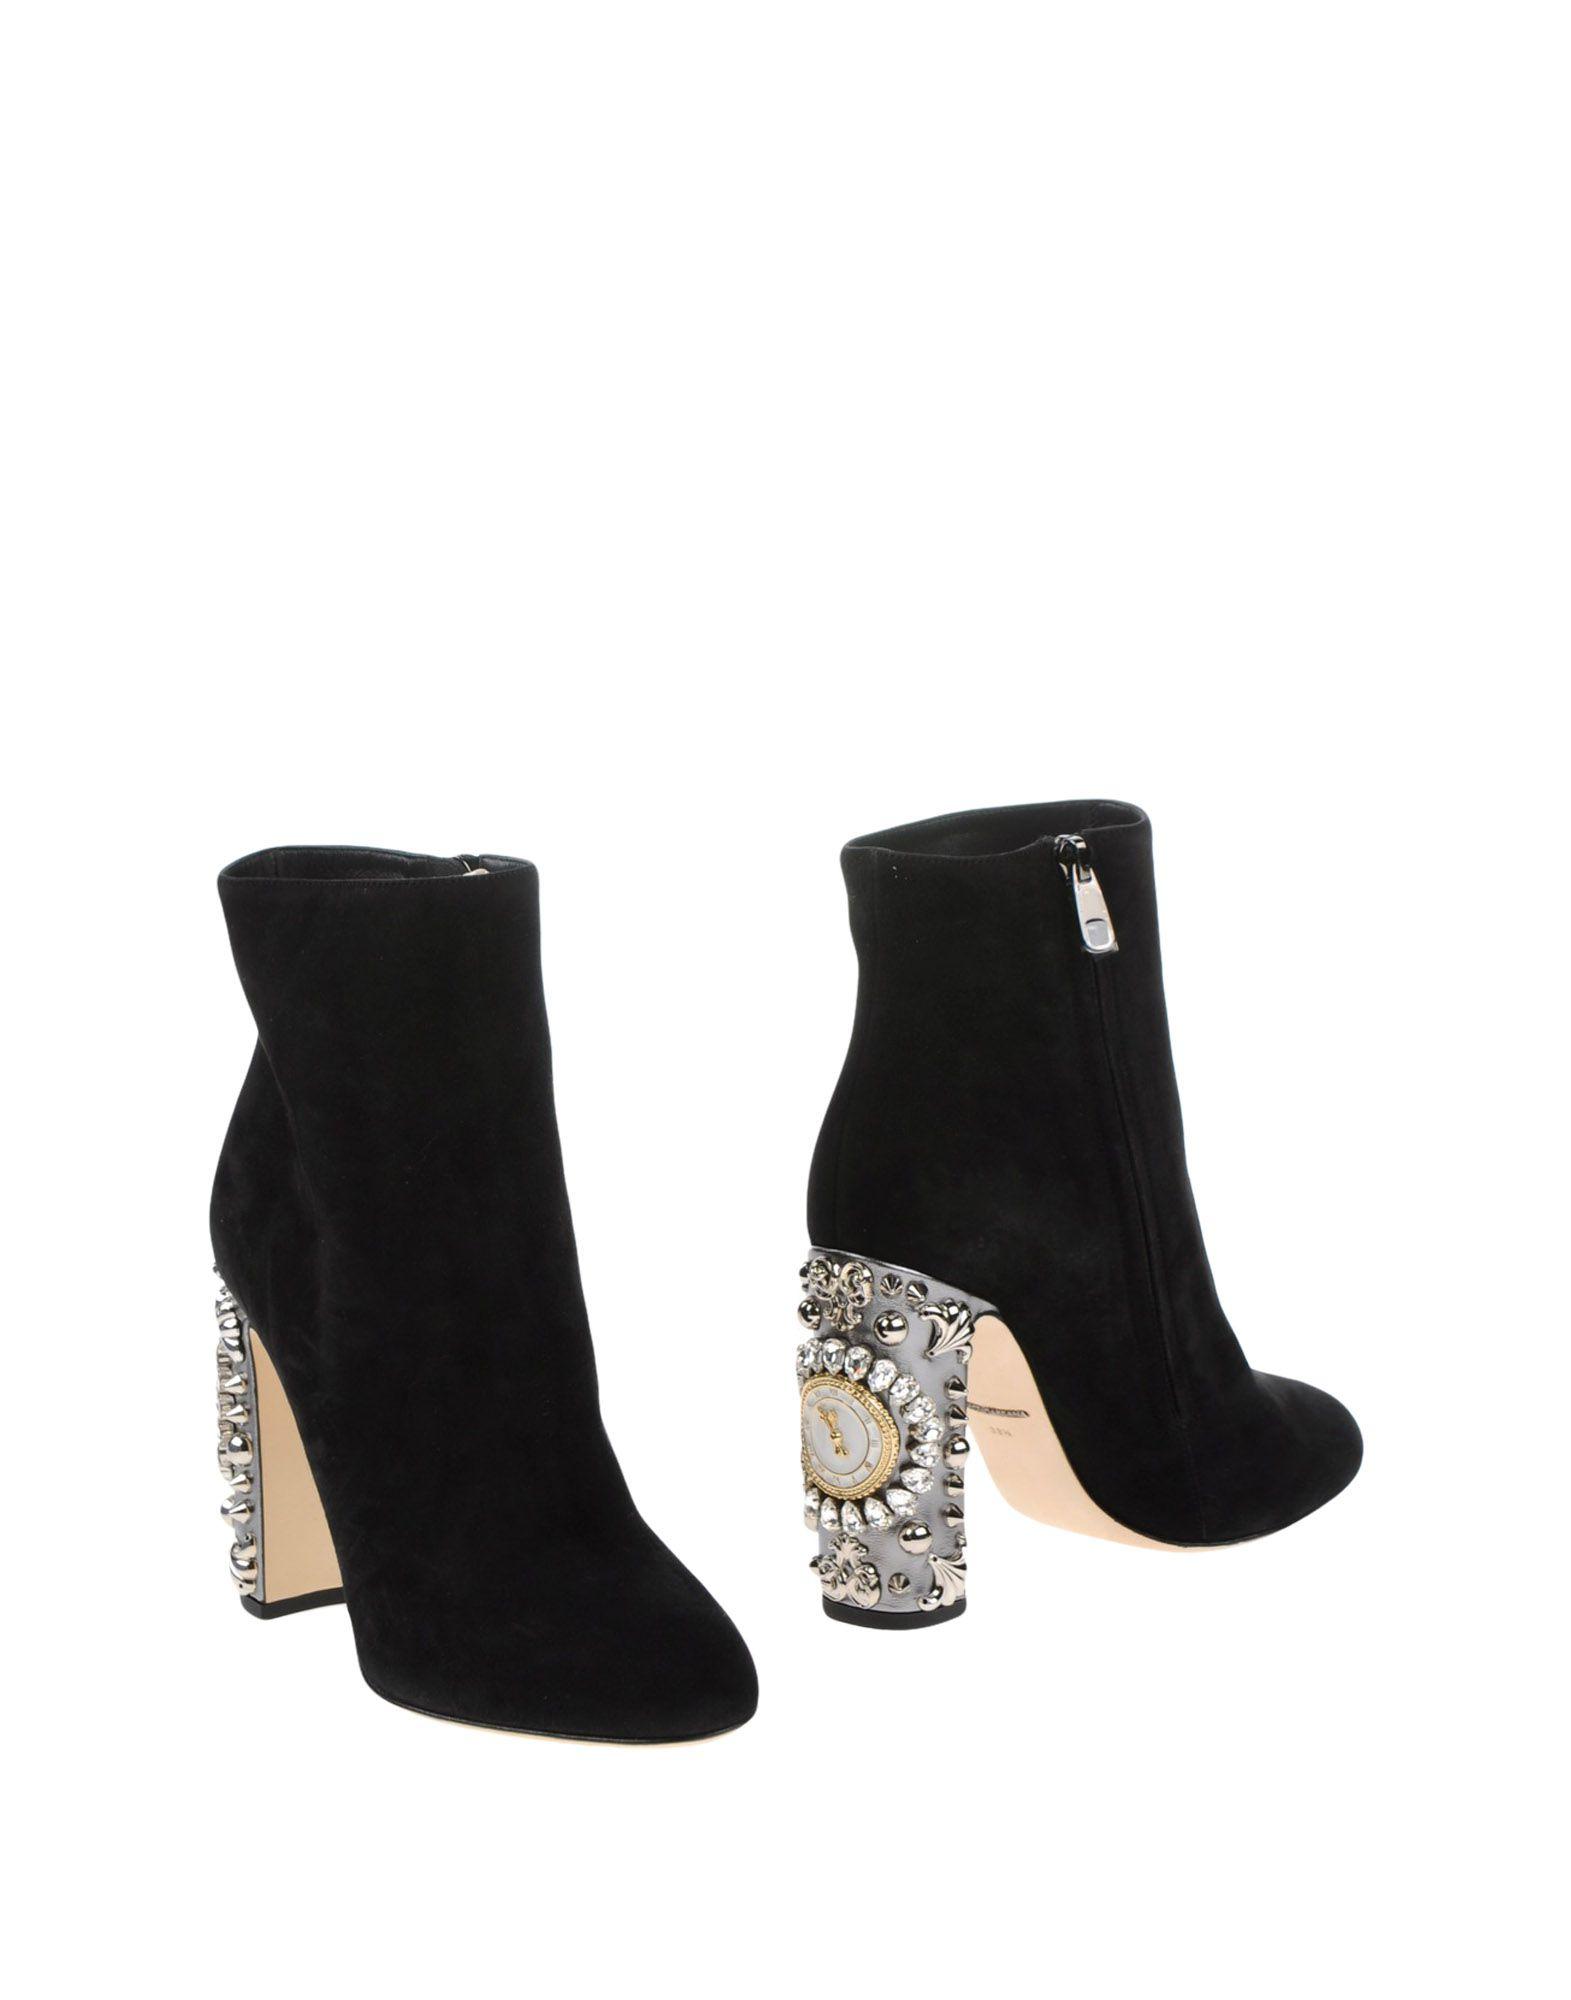 Dolce & Gabbana Stiefelette Damen Damen Damen  11214524EM Neue Schuhe 7d543f